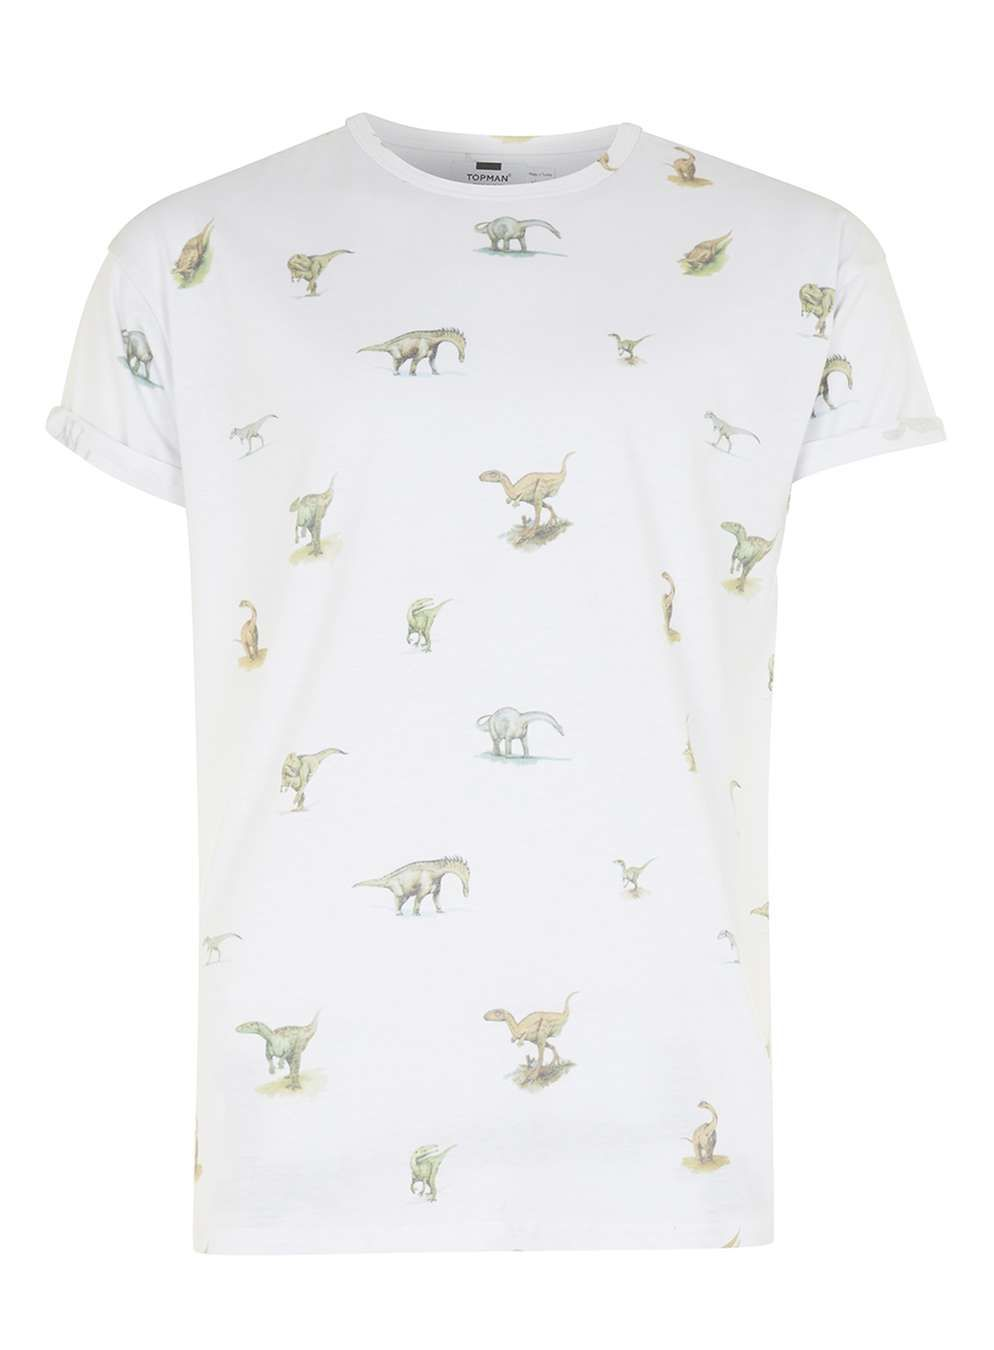 Black t shirt topman - White Dinosaur Print T Shirt Men S T Shirts Vests Clothing